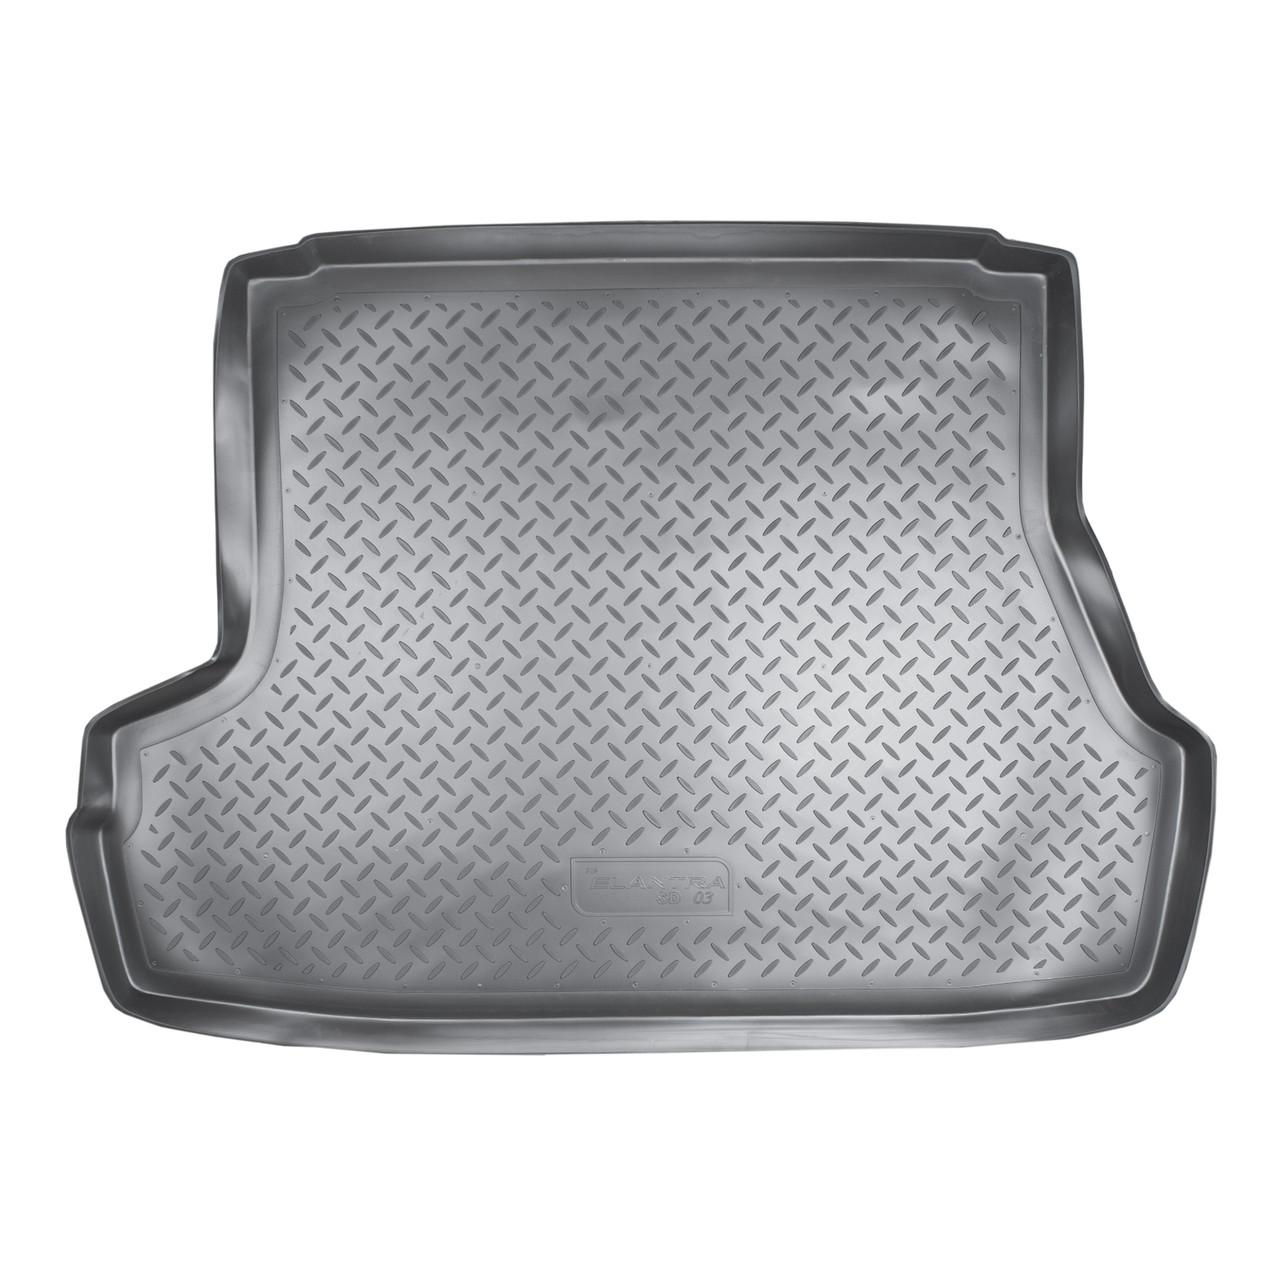 Коврик в багажник Hyundai Elantra (XD) SD (2001-2006)